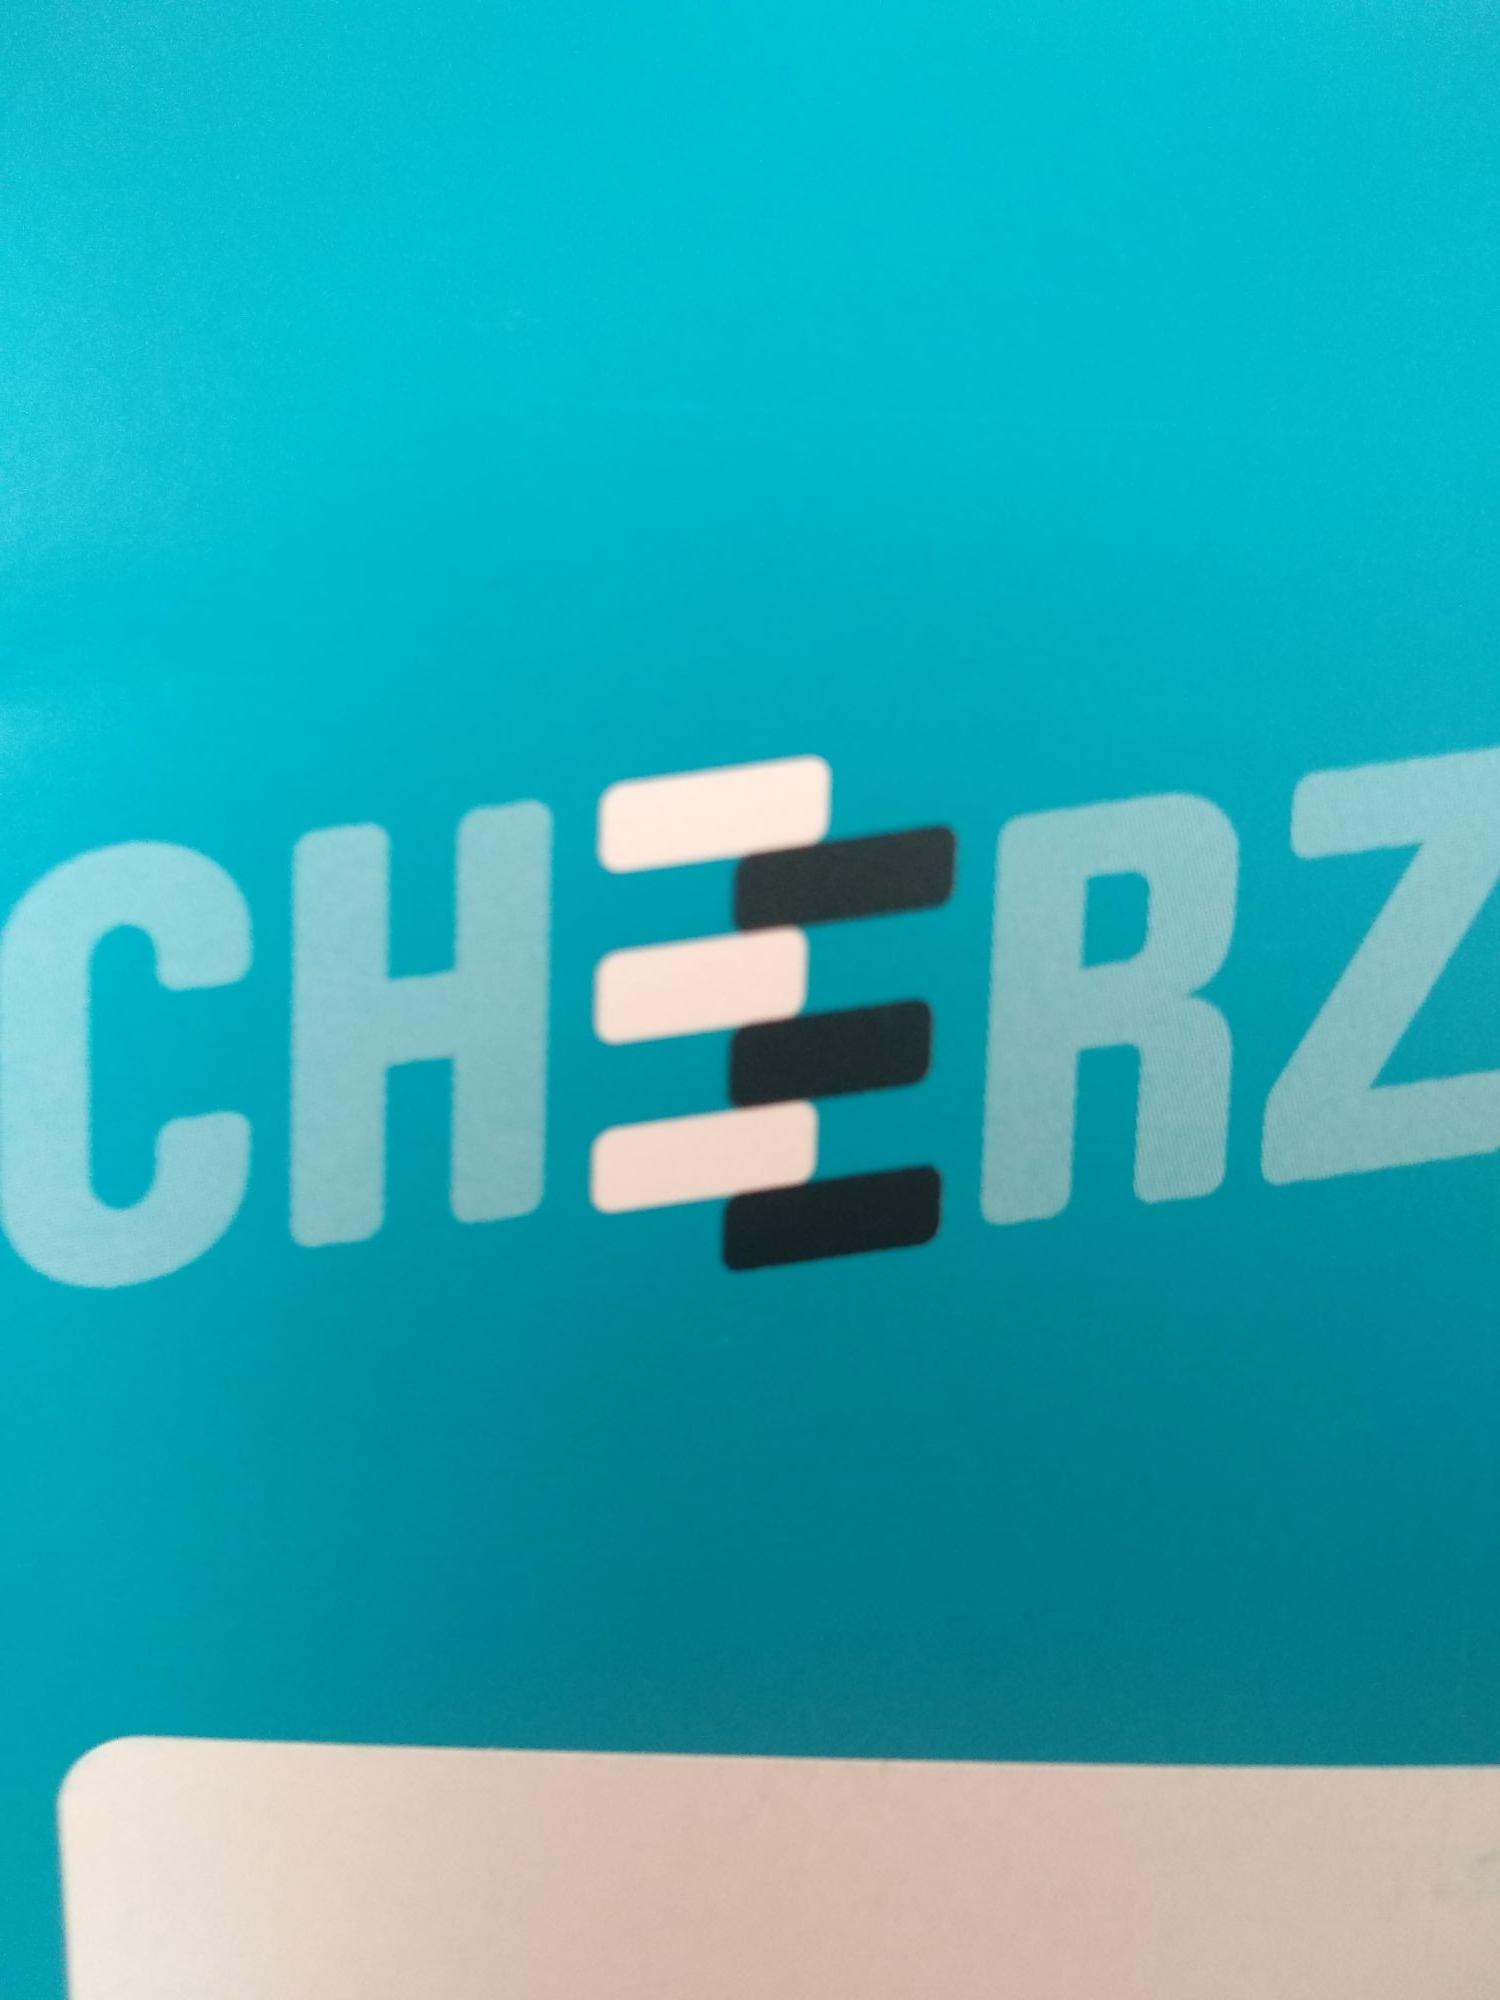 5€ de descuento en CHEERZ-Imprime fotos tipo polaroid